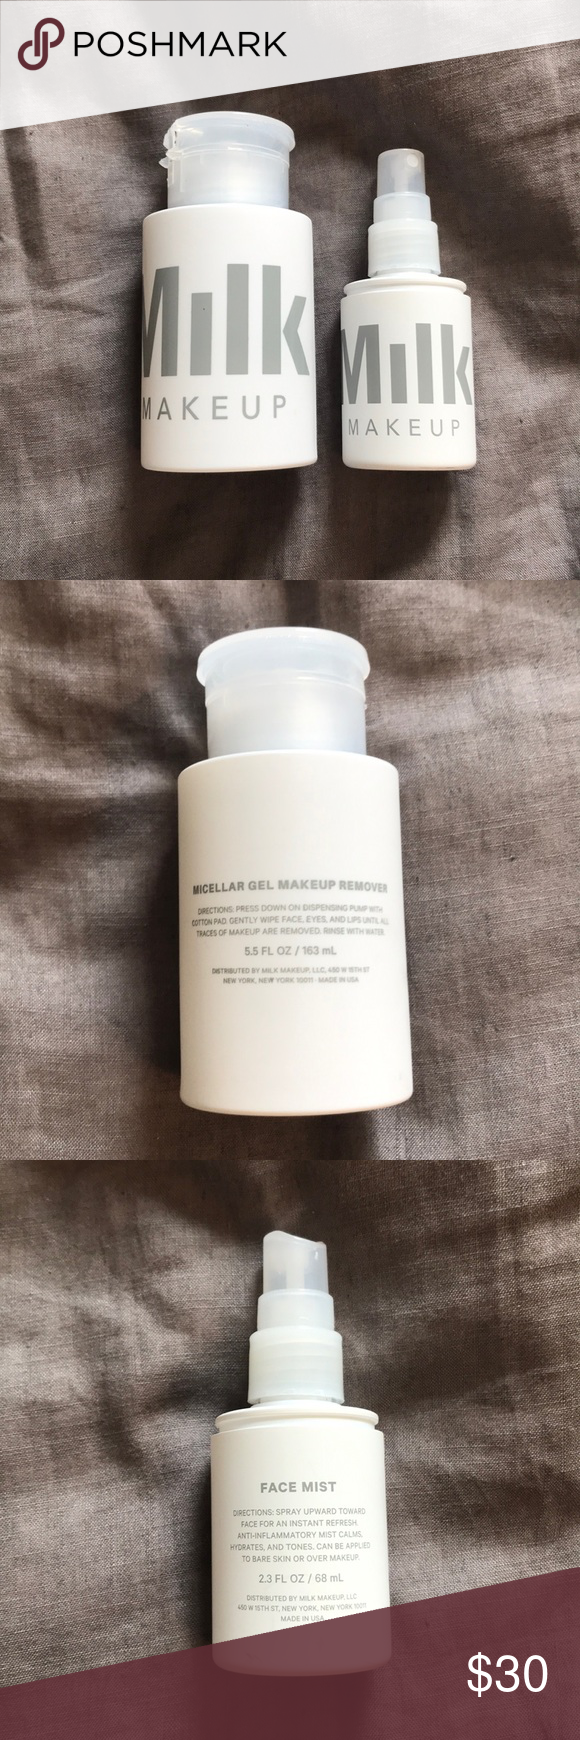 Milk Makeup Micellar Gel Remover & Face Mist Duo Milk